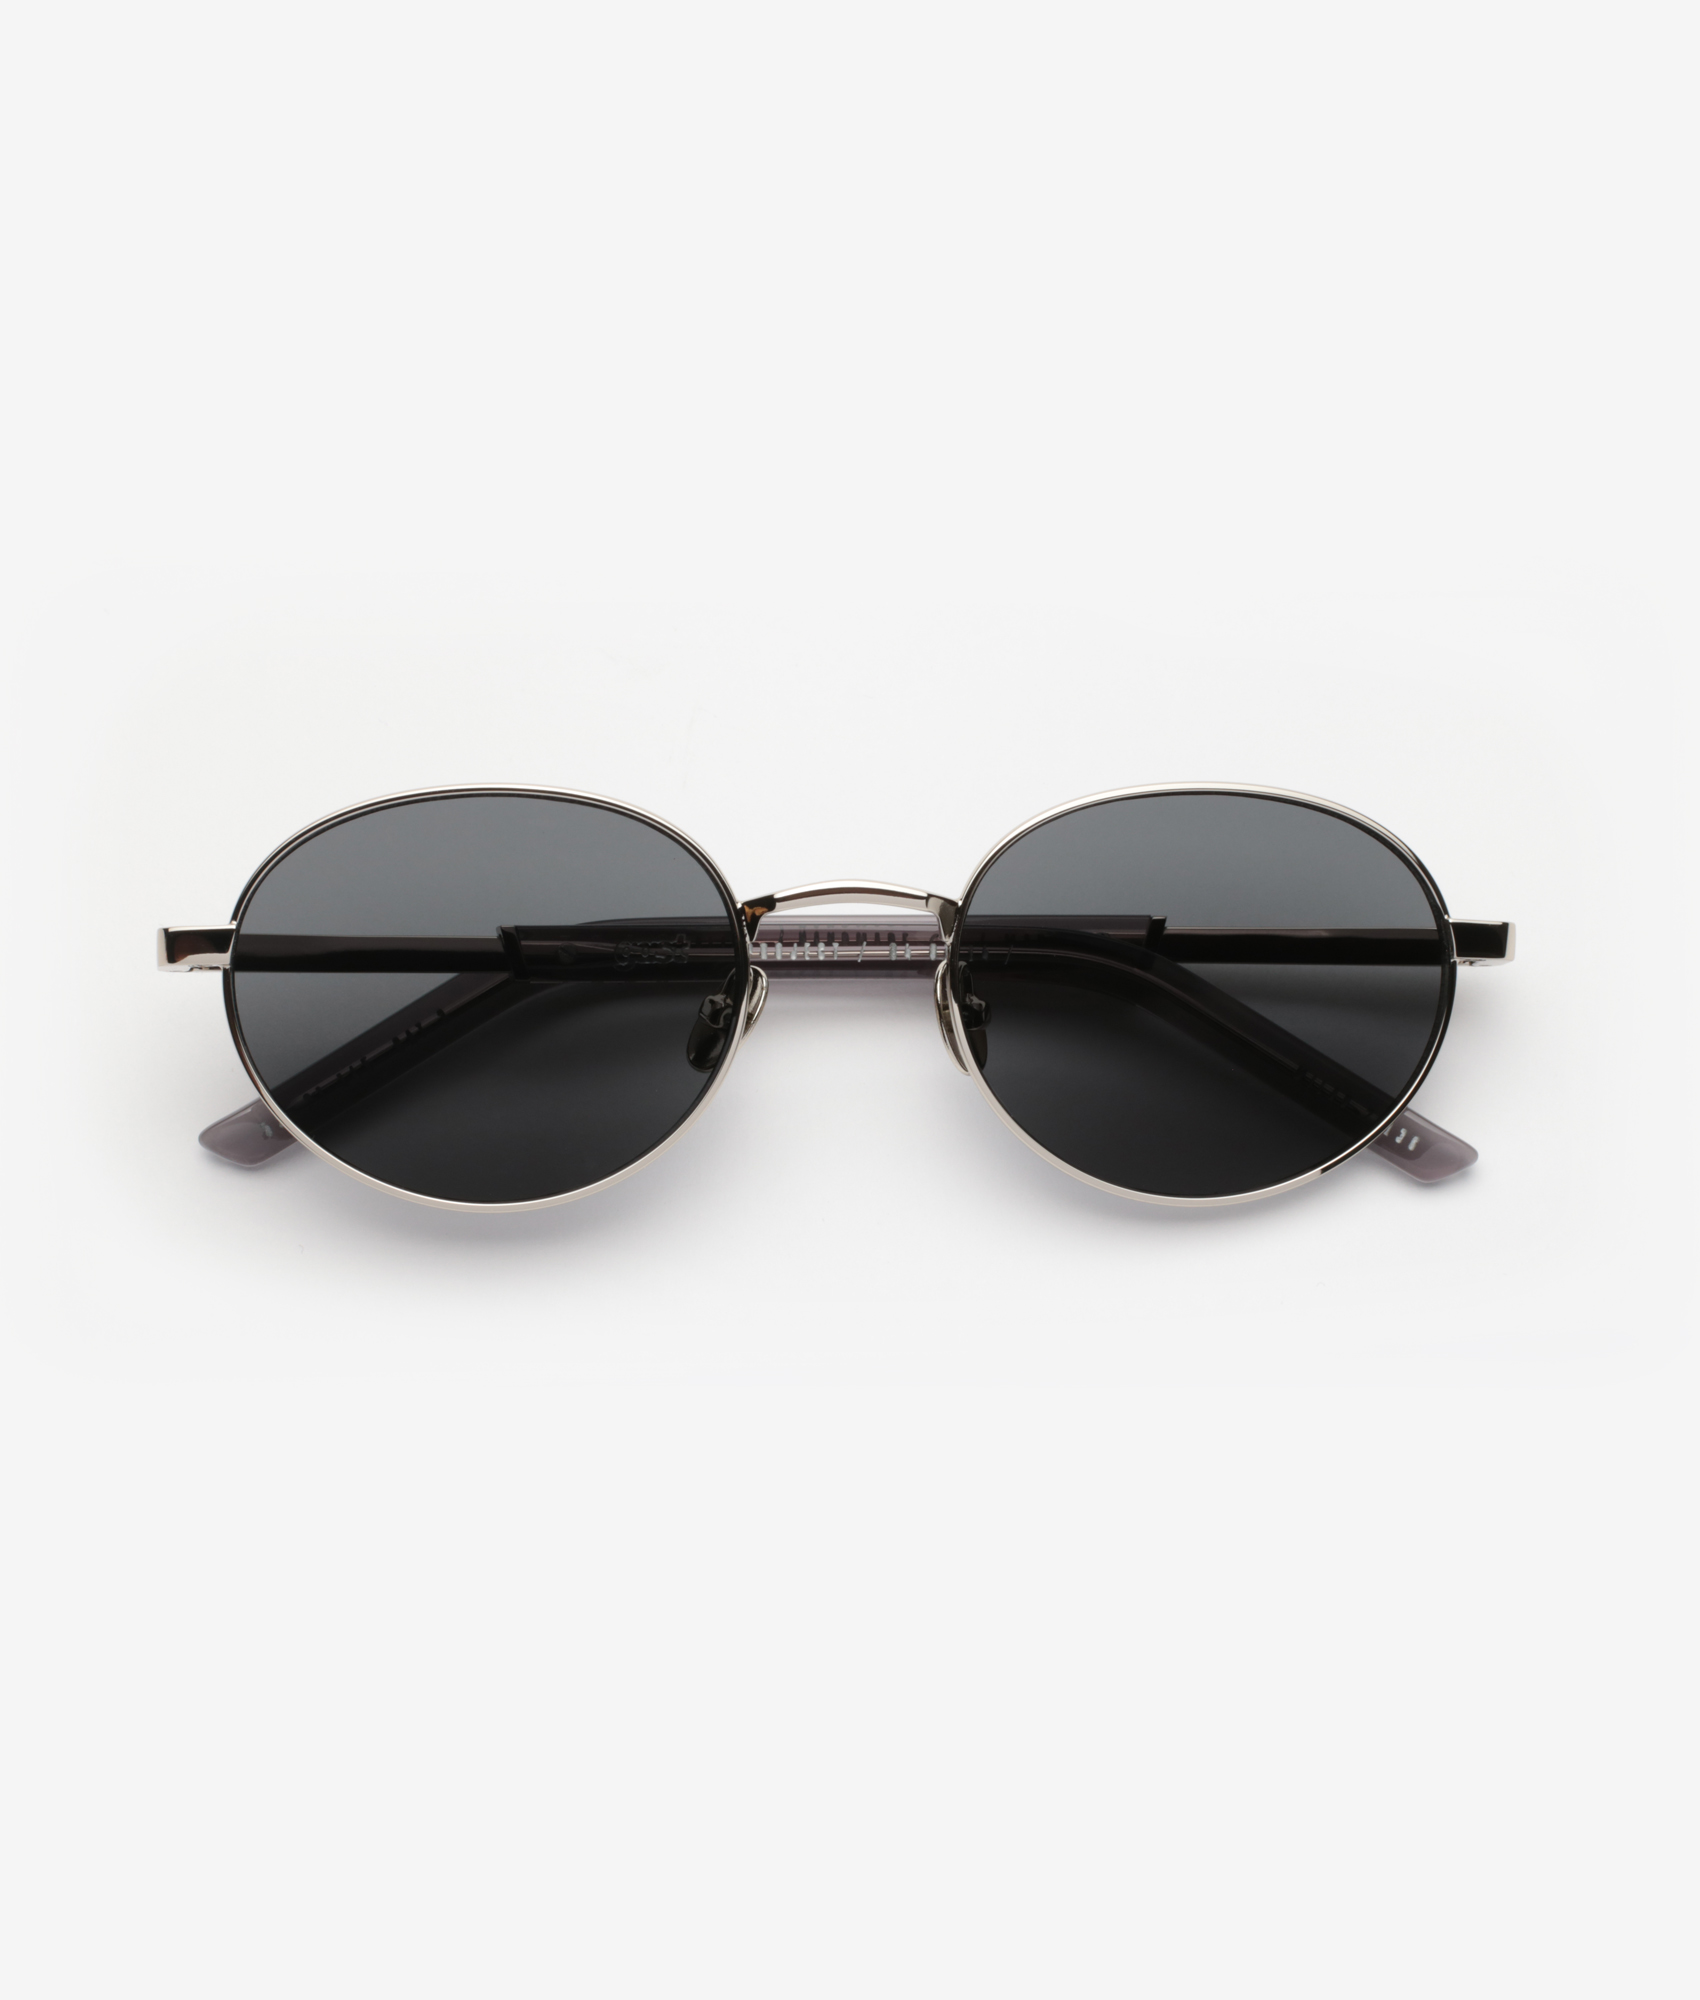 Salin Silver Gast Sunglasses